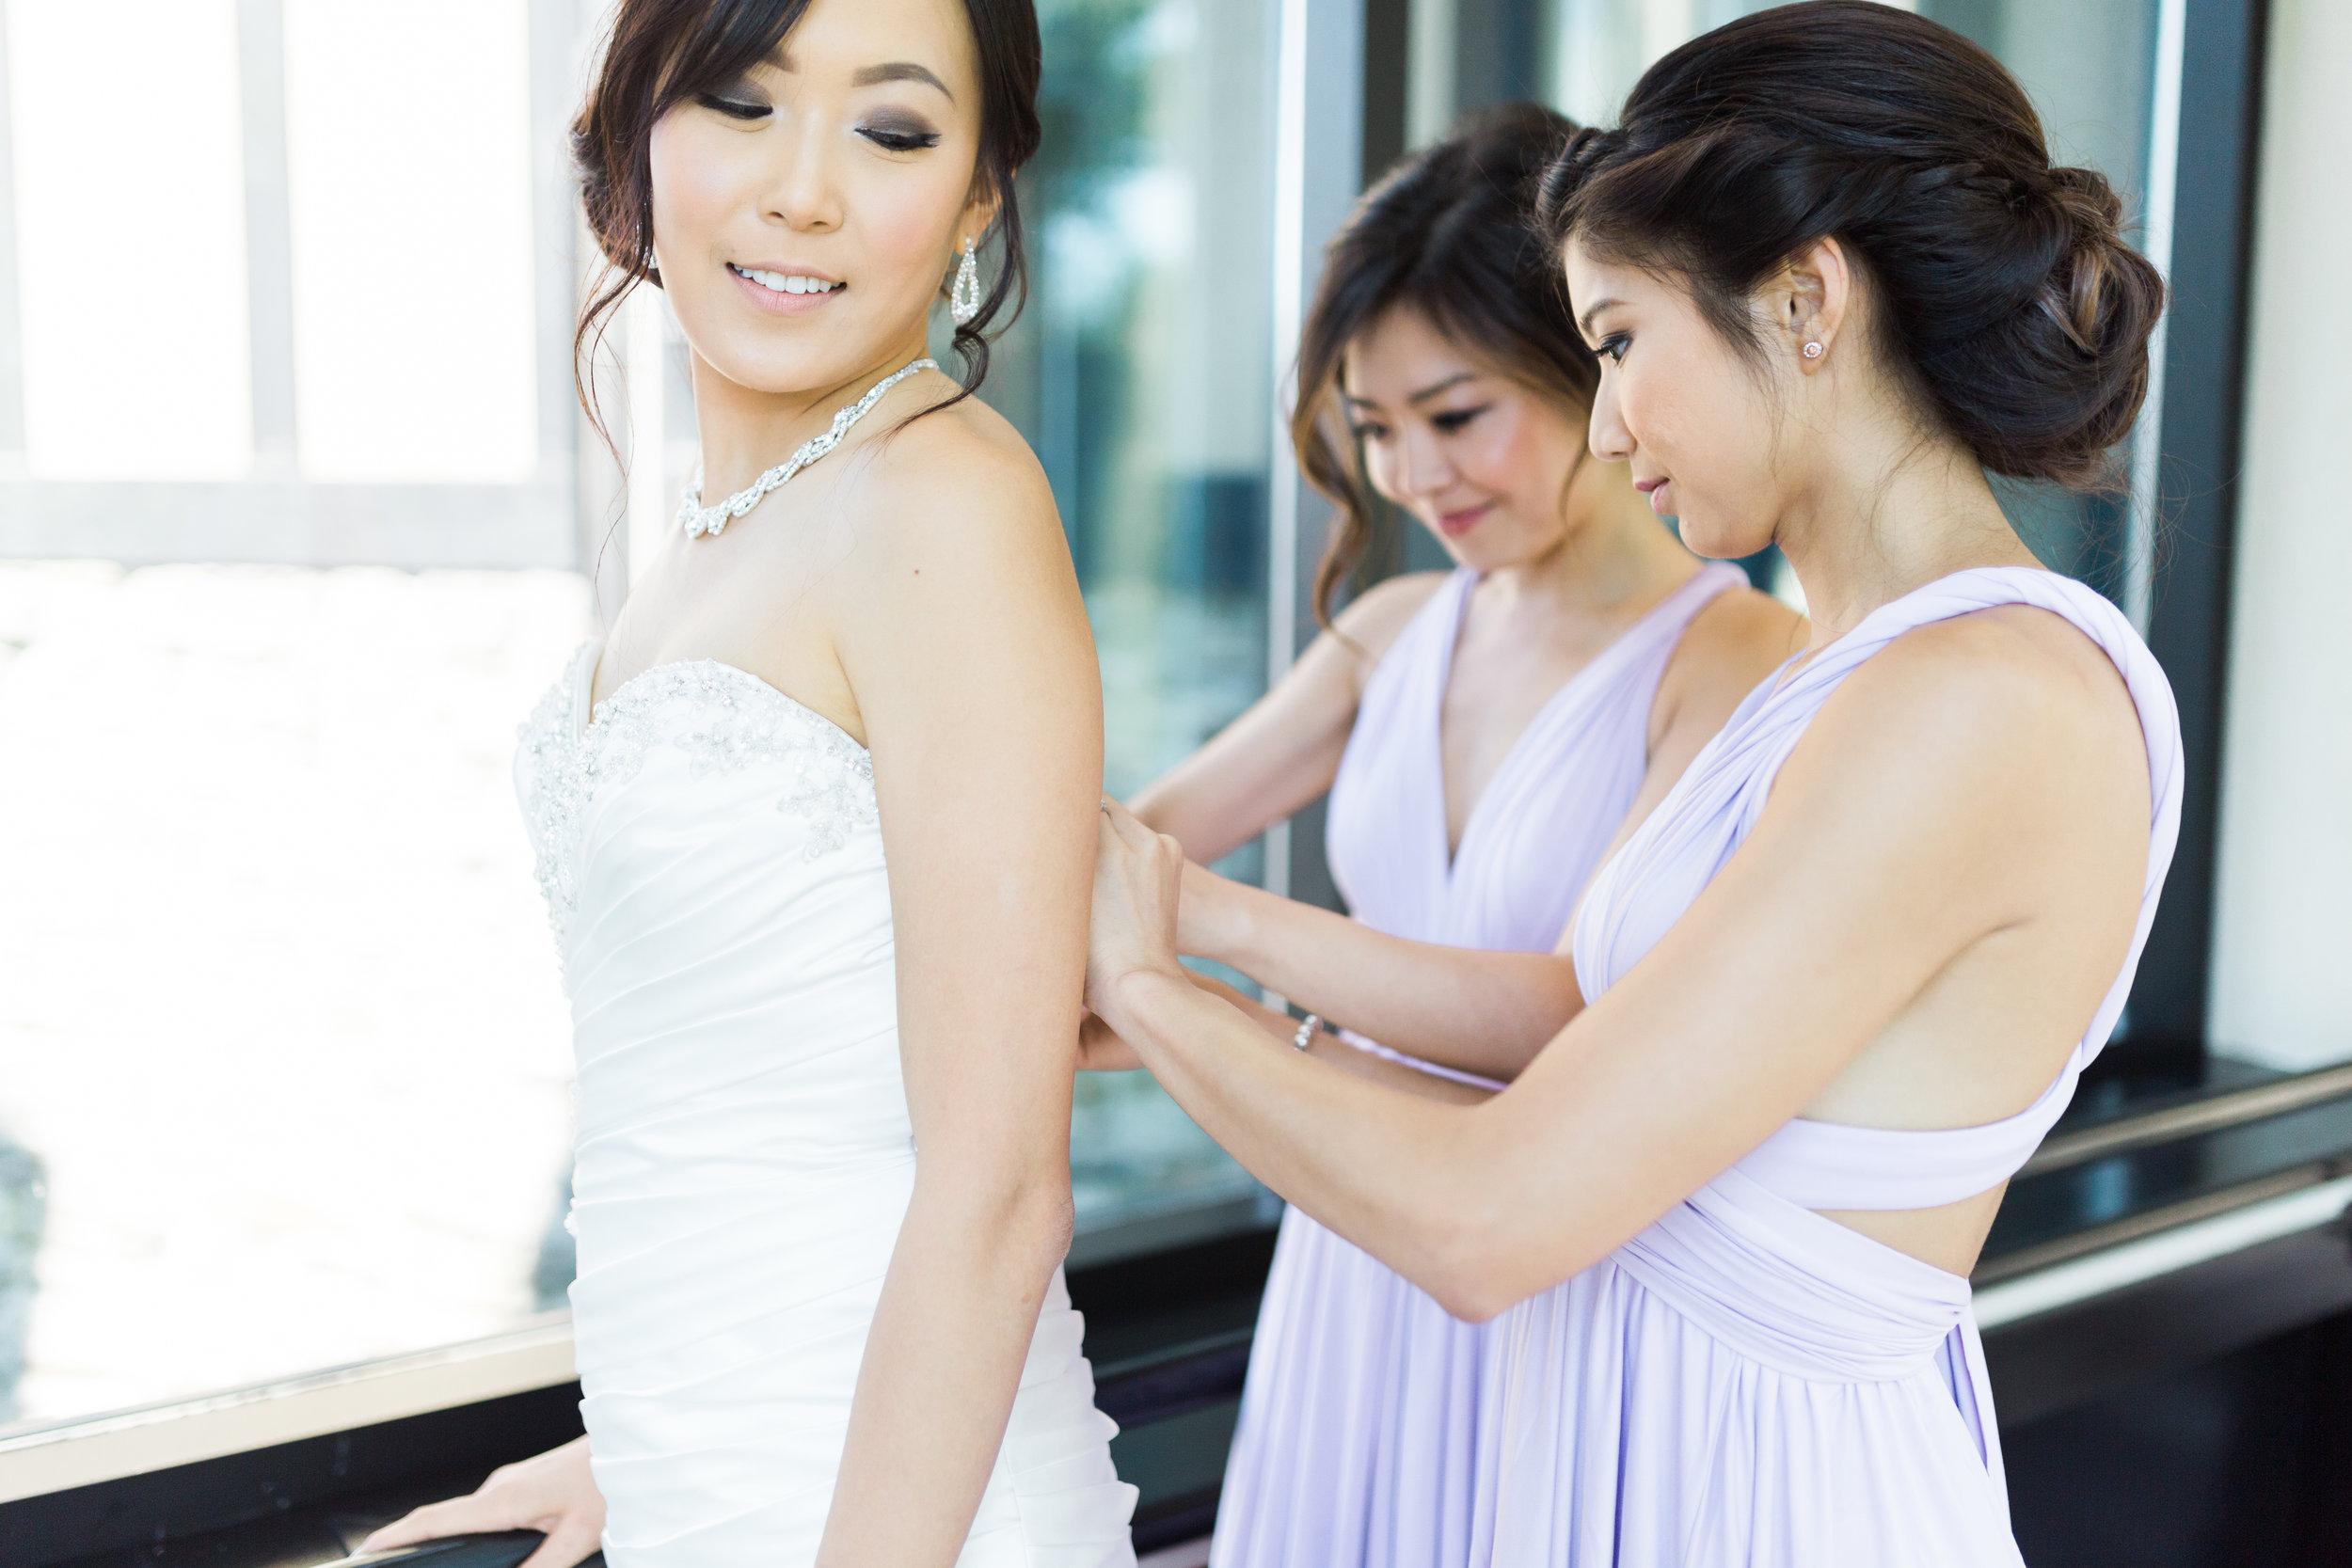 Toronto Fine Art Photographer - Old Mill Wedding - Bride Getting Ready-3.jpg